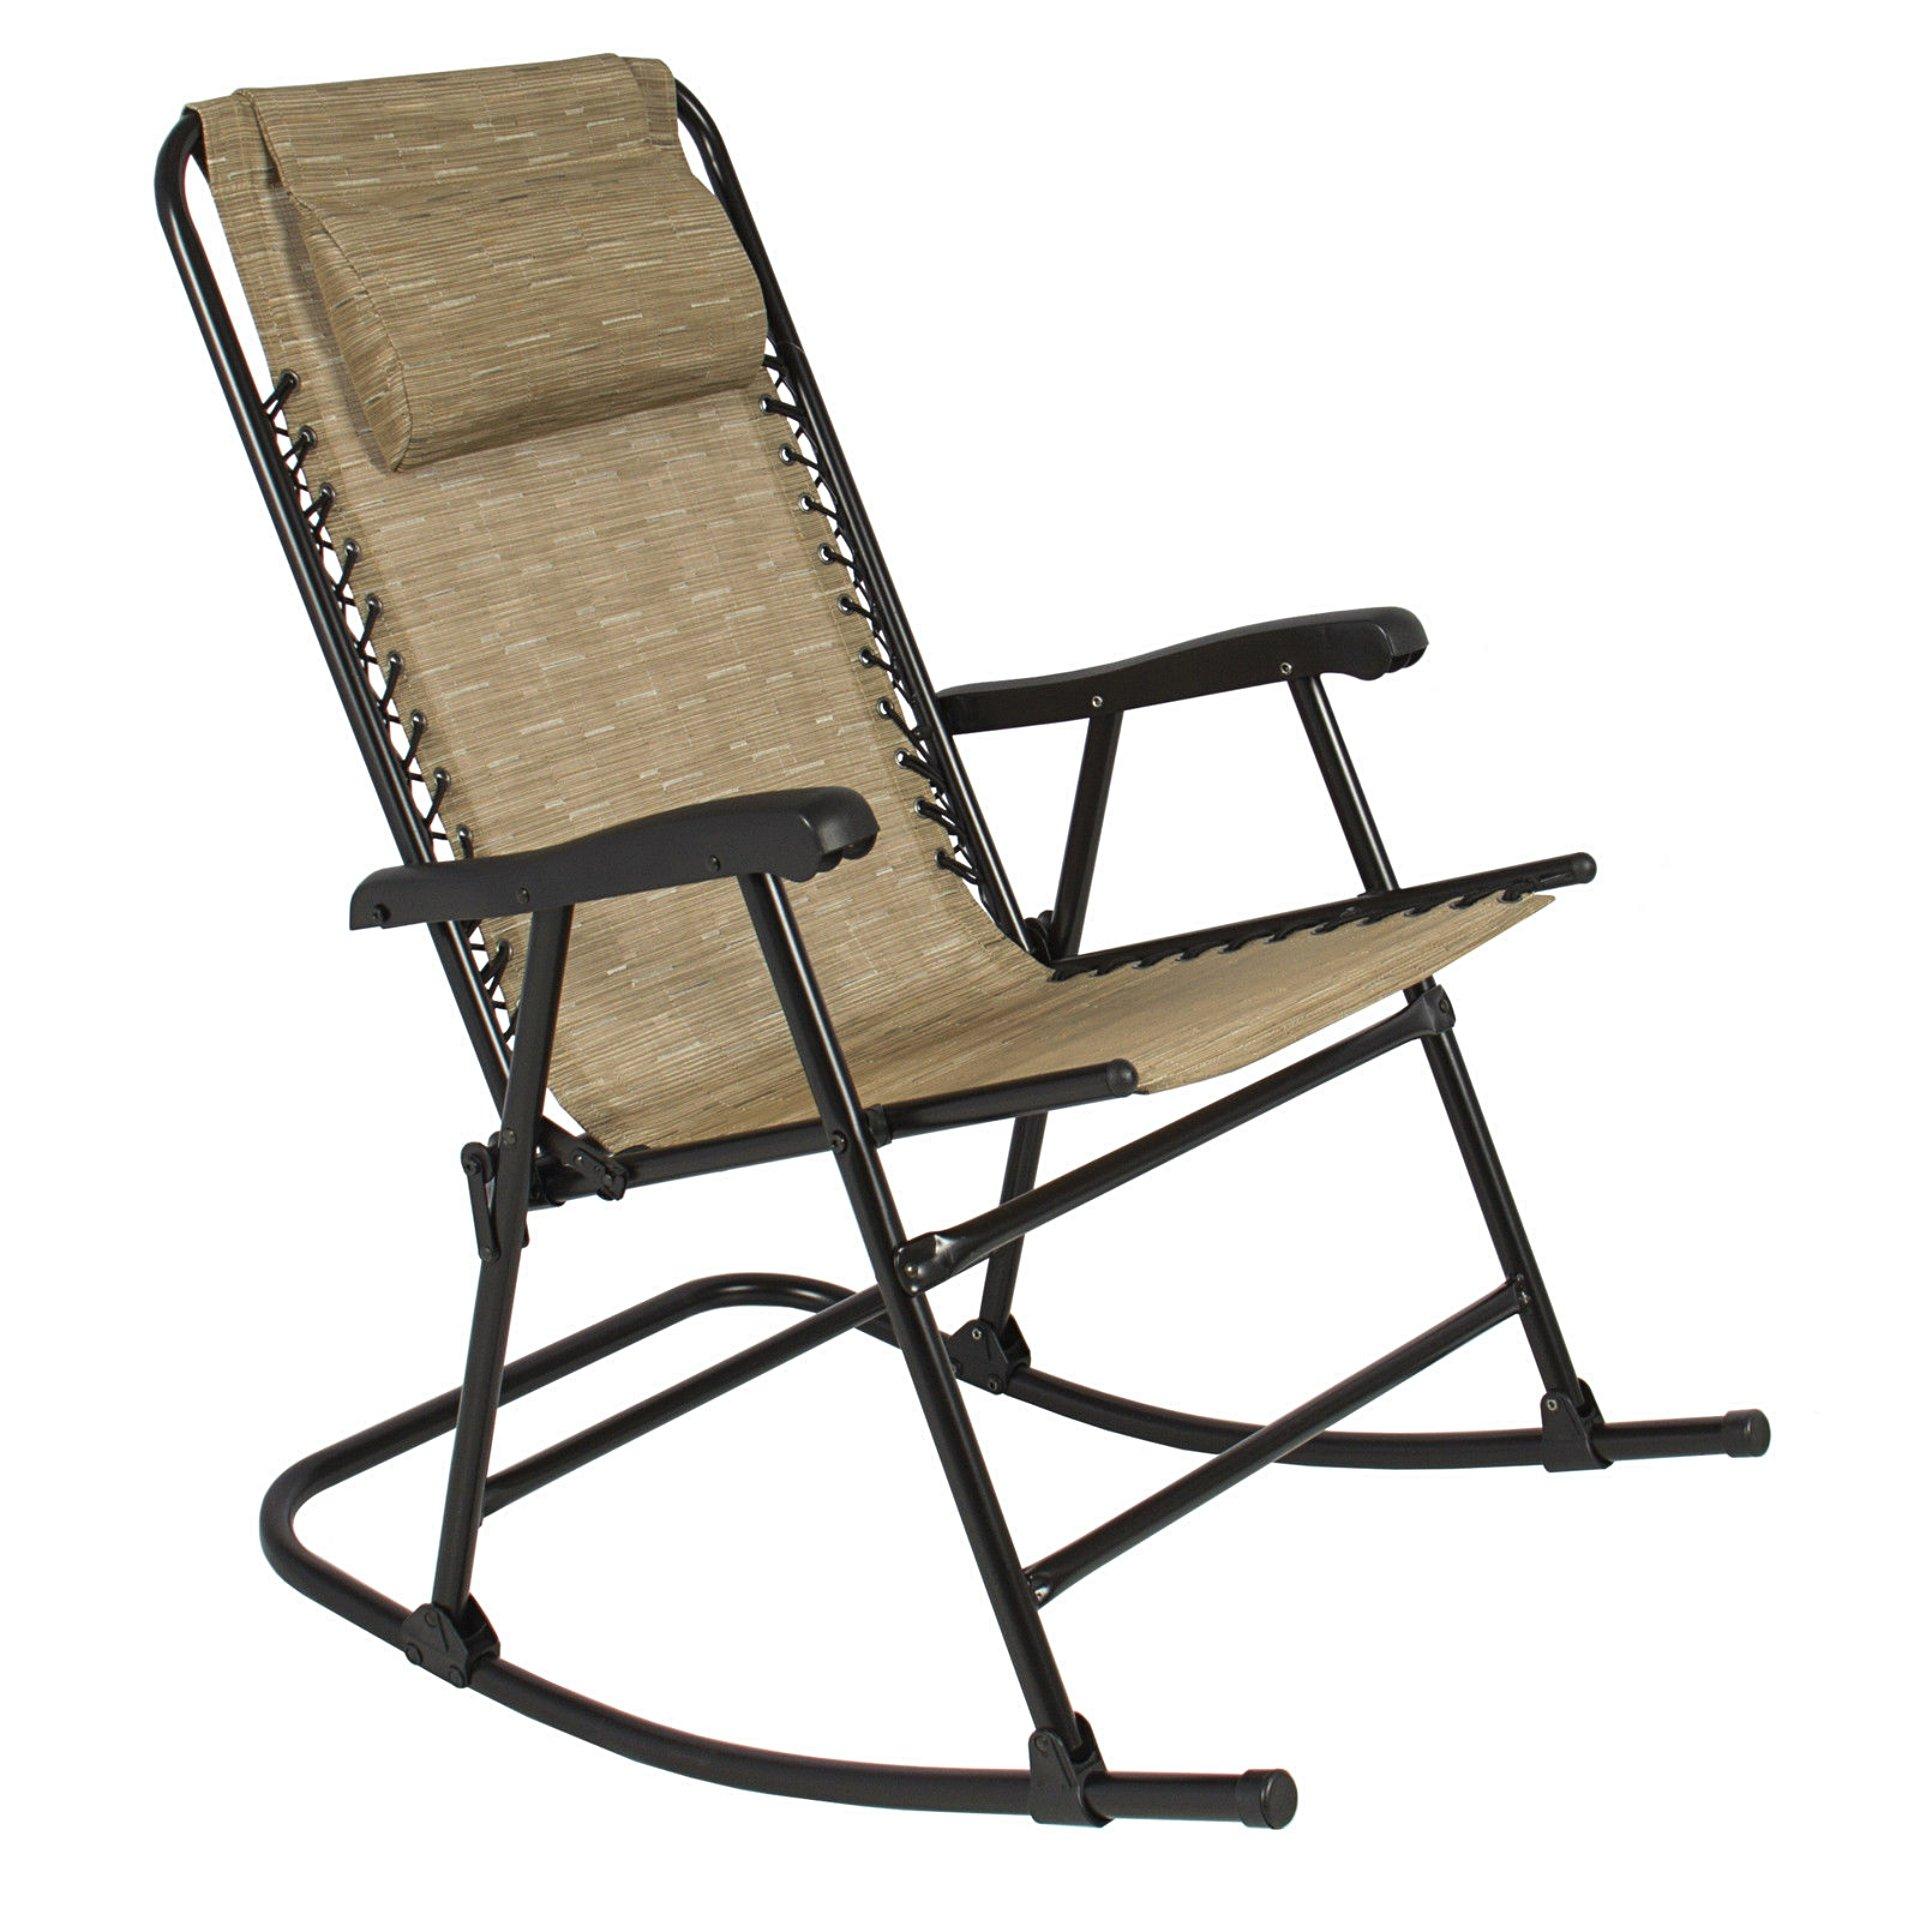 Patio Rocking Chair Foldable Rocker Backyard Outdoor Furniture UV-resistant Beige #262 by koonlertshop